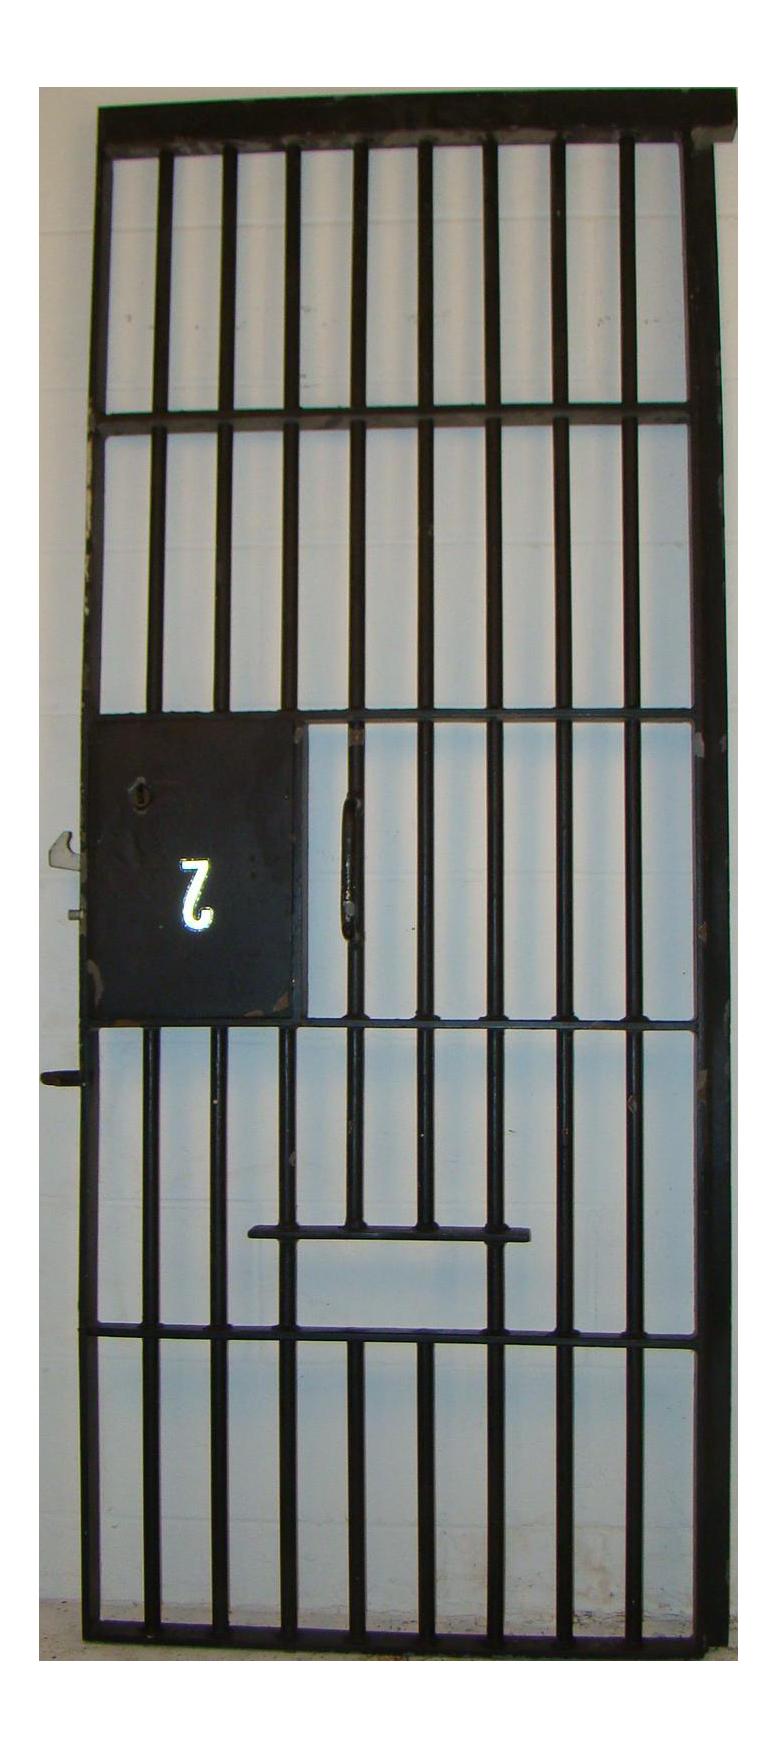 Vintage Prison Door u0026 Key  sc 1 st  Chairish & Vintage Prison Door u0026 Key | Chairish